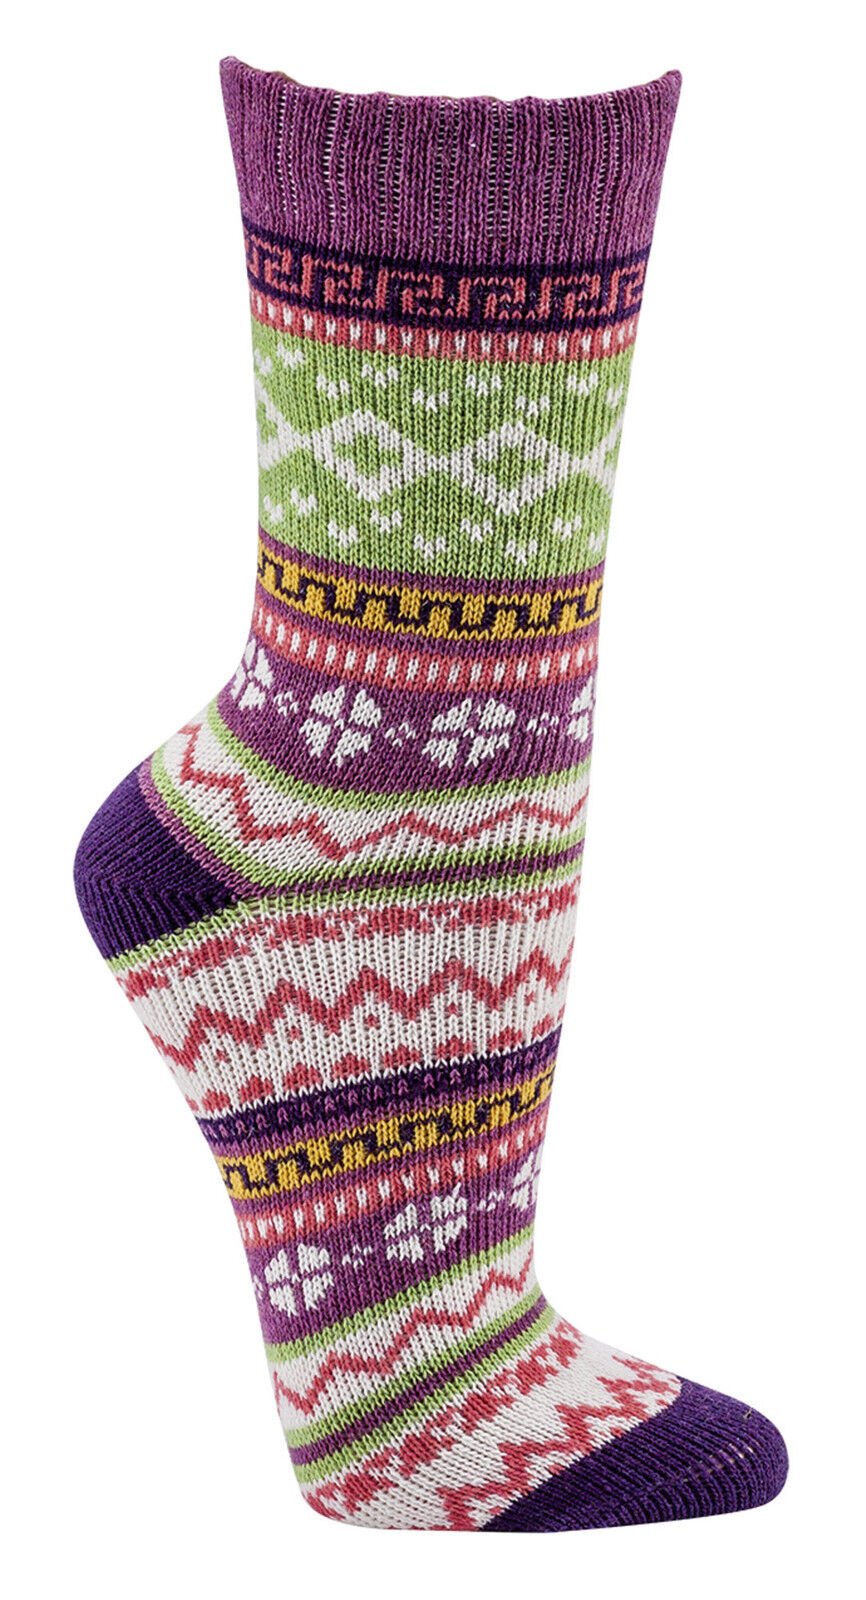 Damen & Teens Bunte Norweger Socken * 3er-Bündel * Socken mit Schafwolle CH-2217